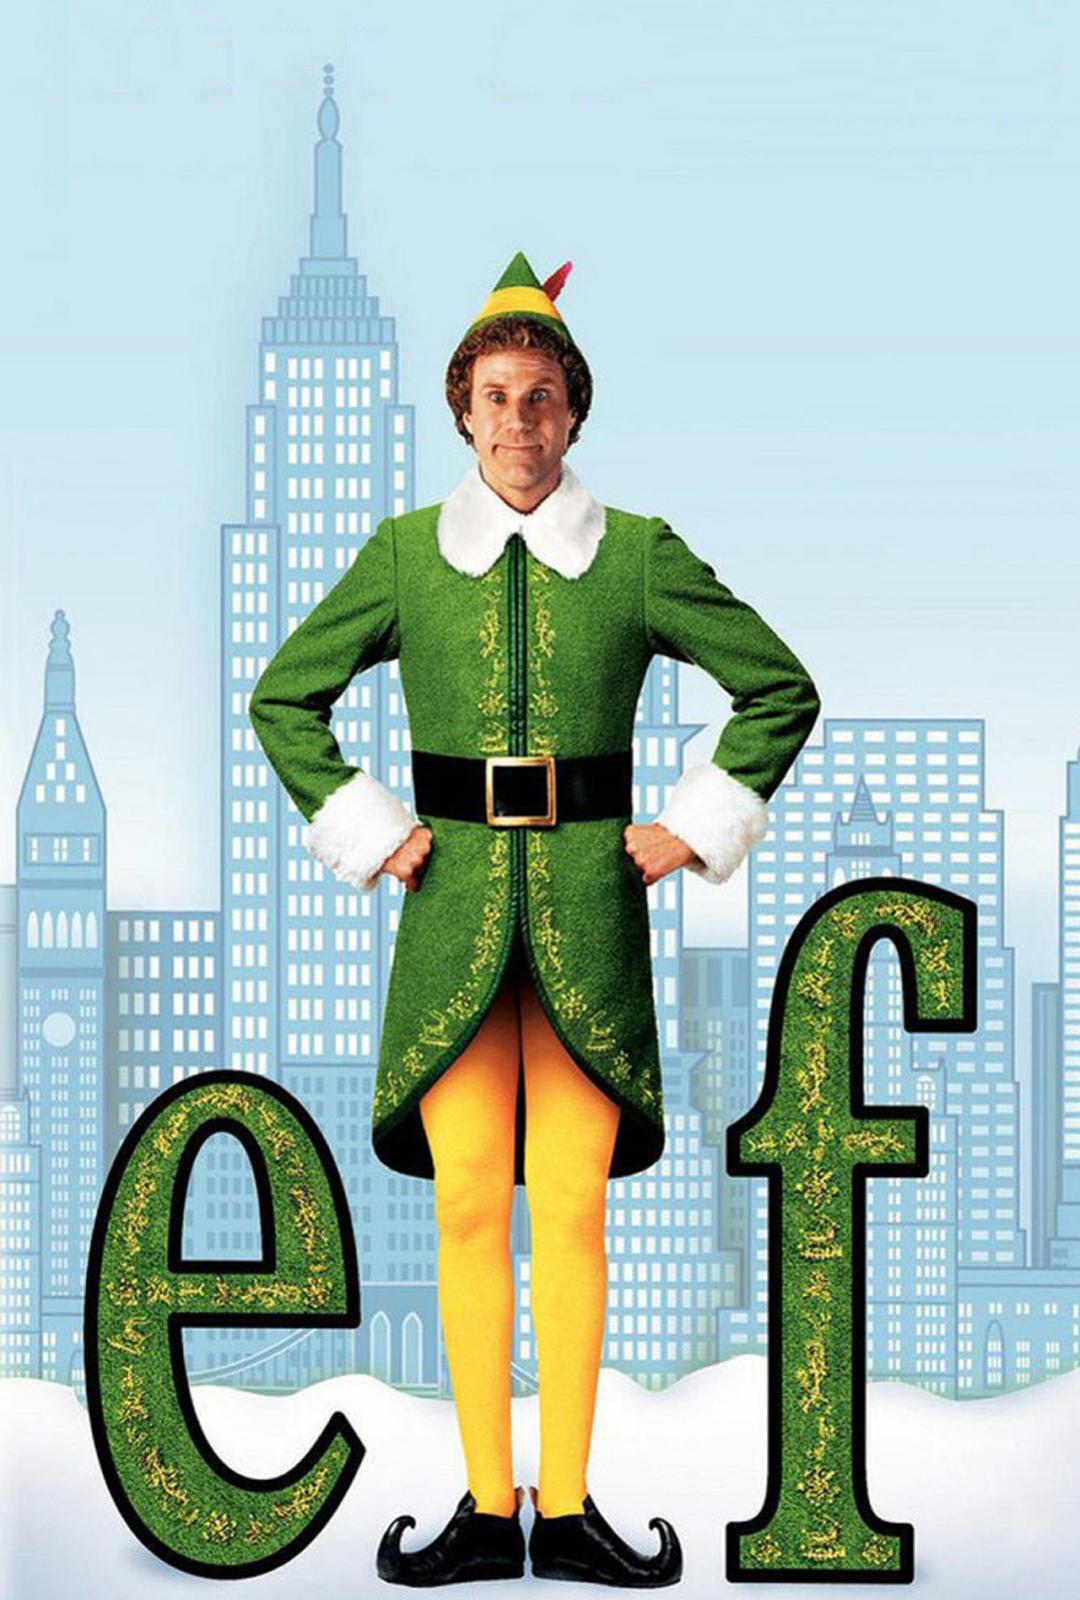 Best-Family-Holiday-Movies-Elf.jpg